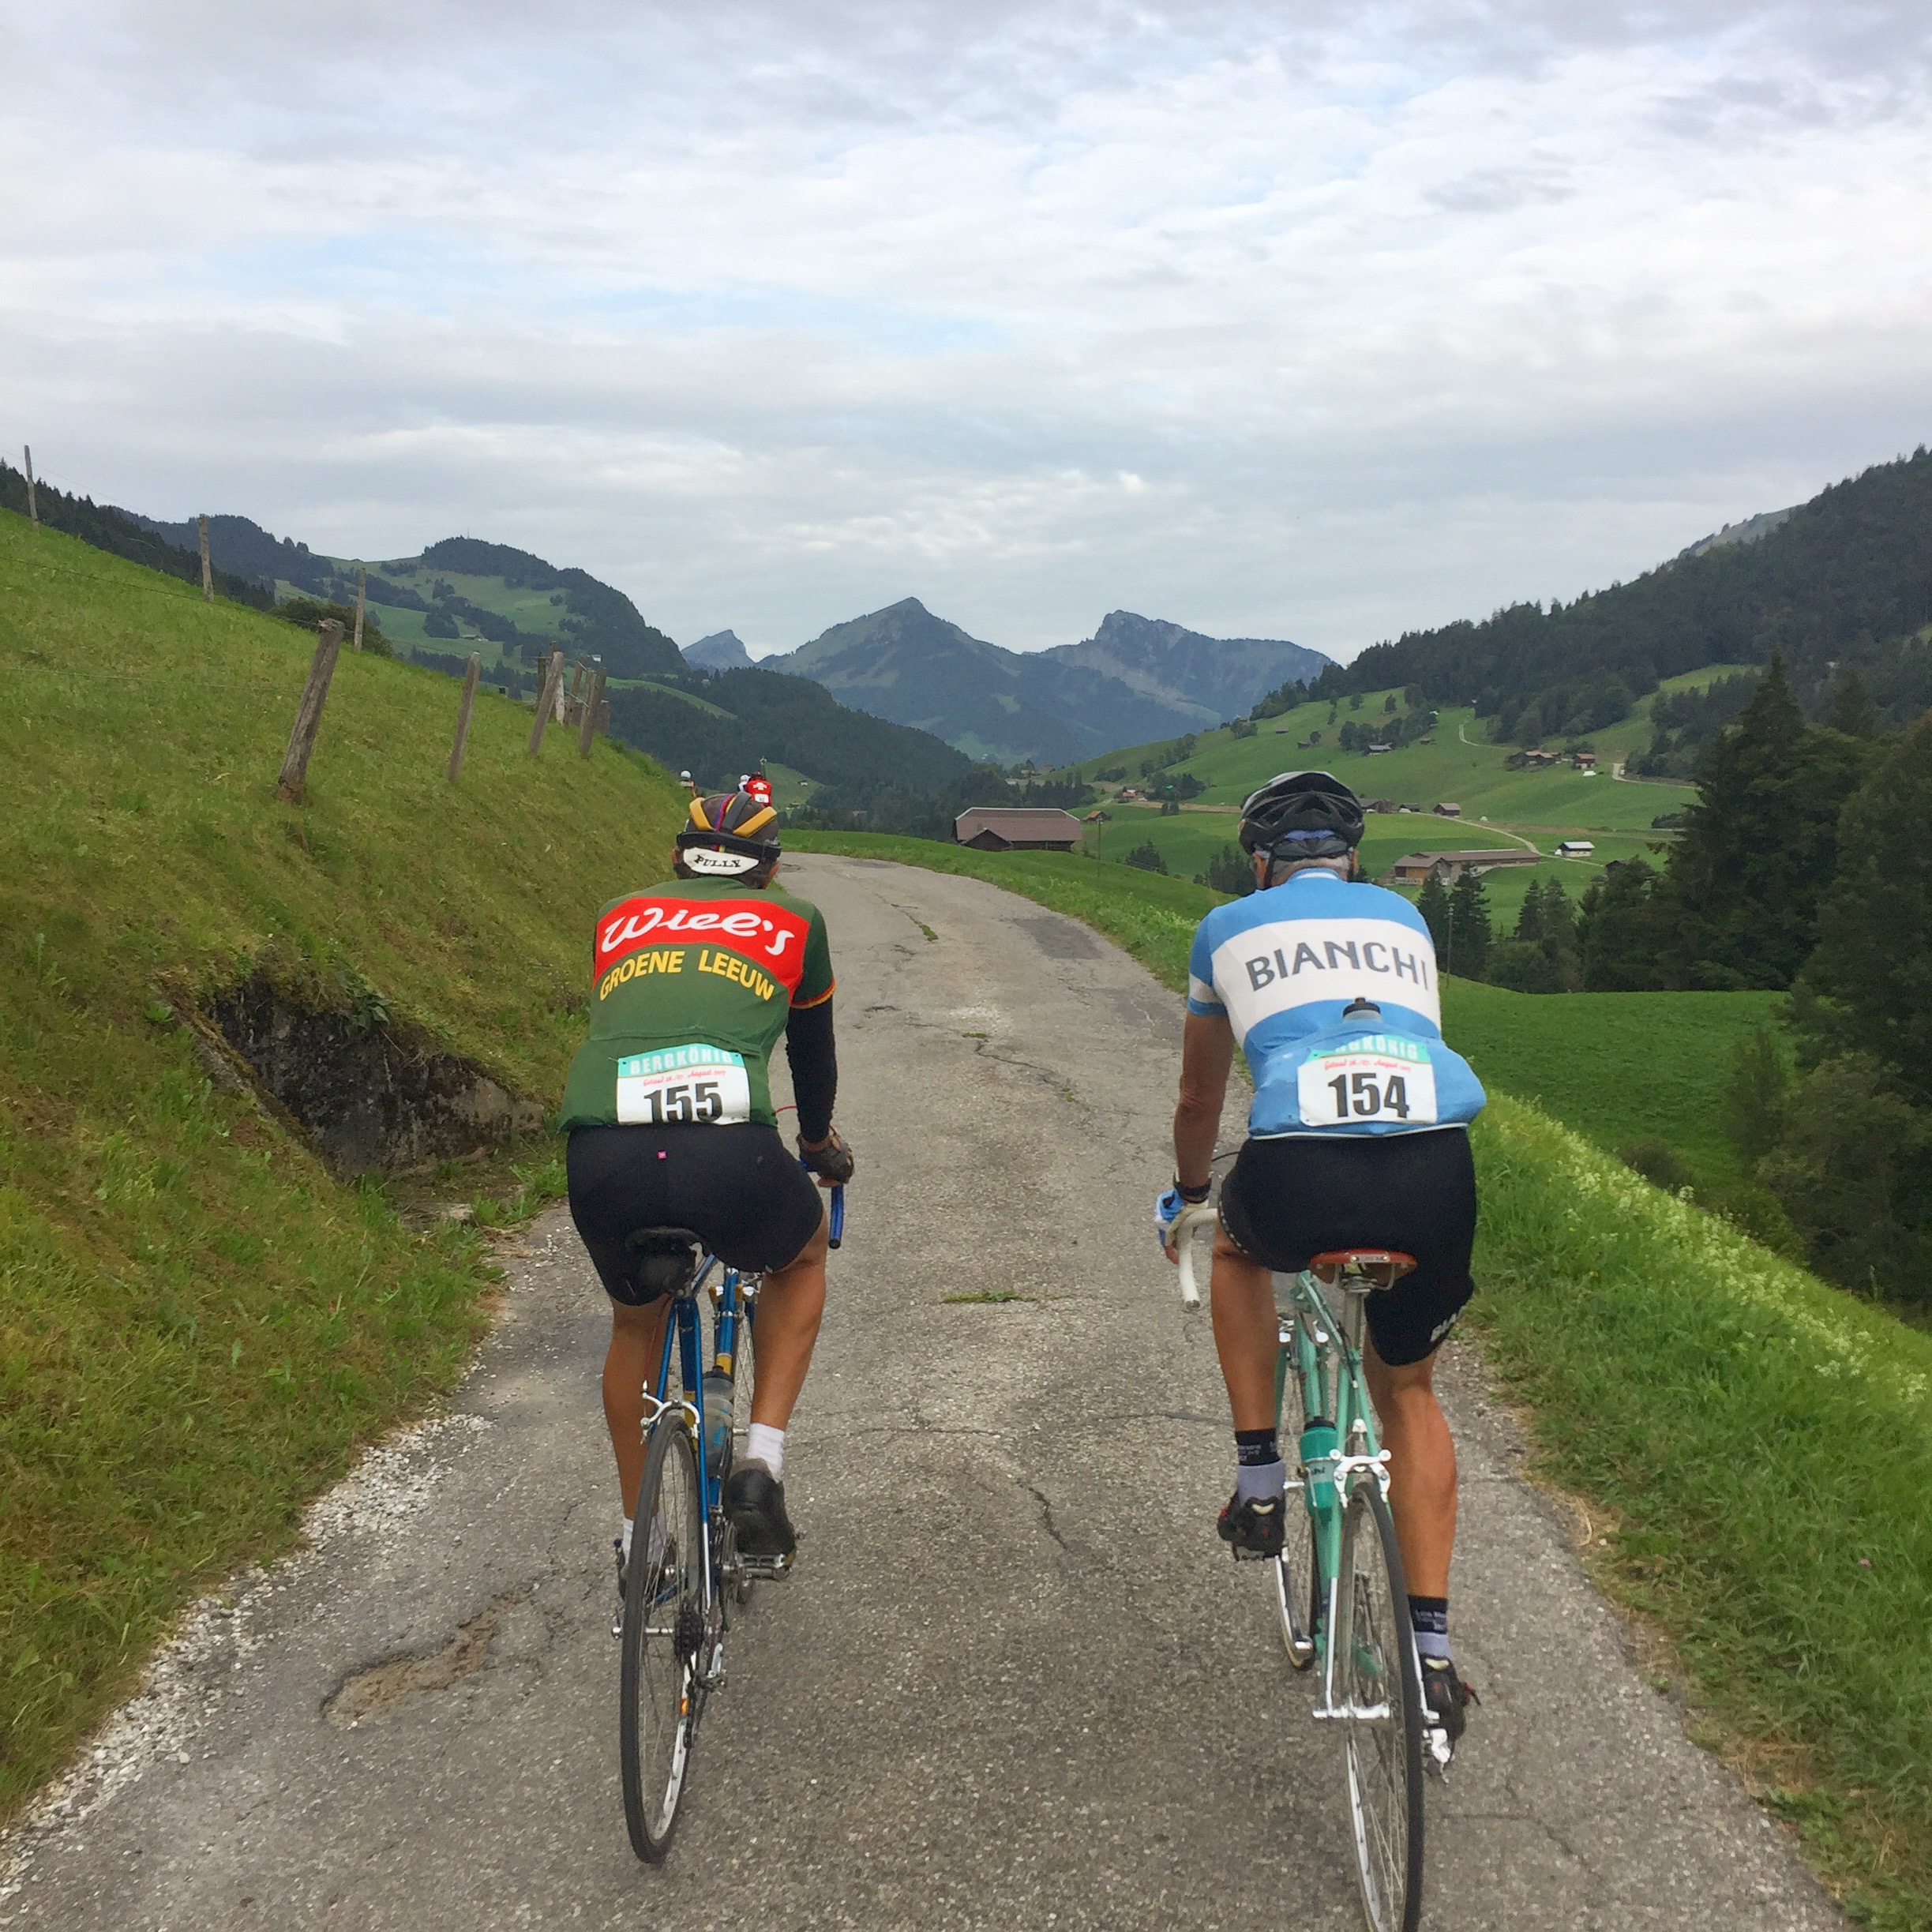 Bergkönig, chic et vélo vintage à Gstaad